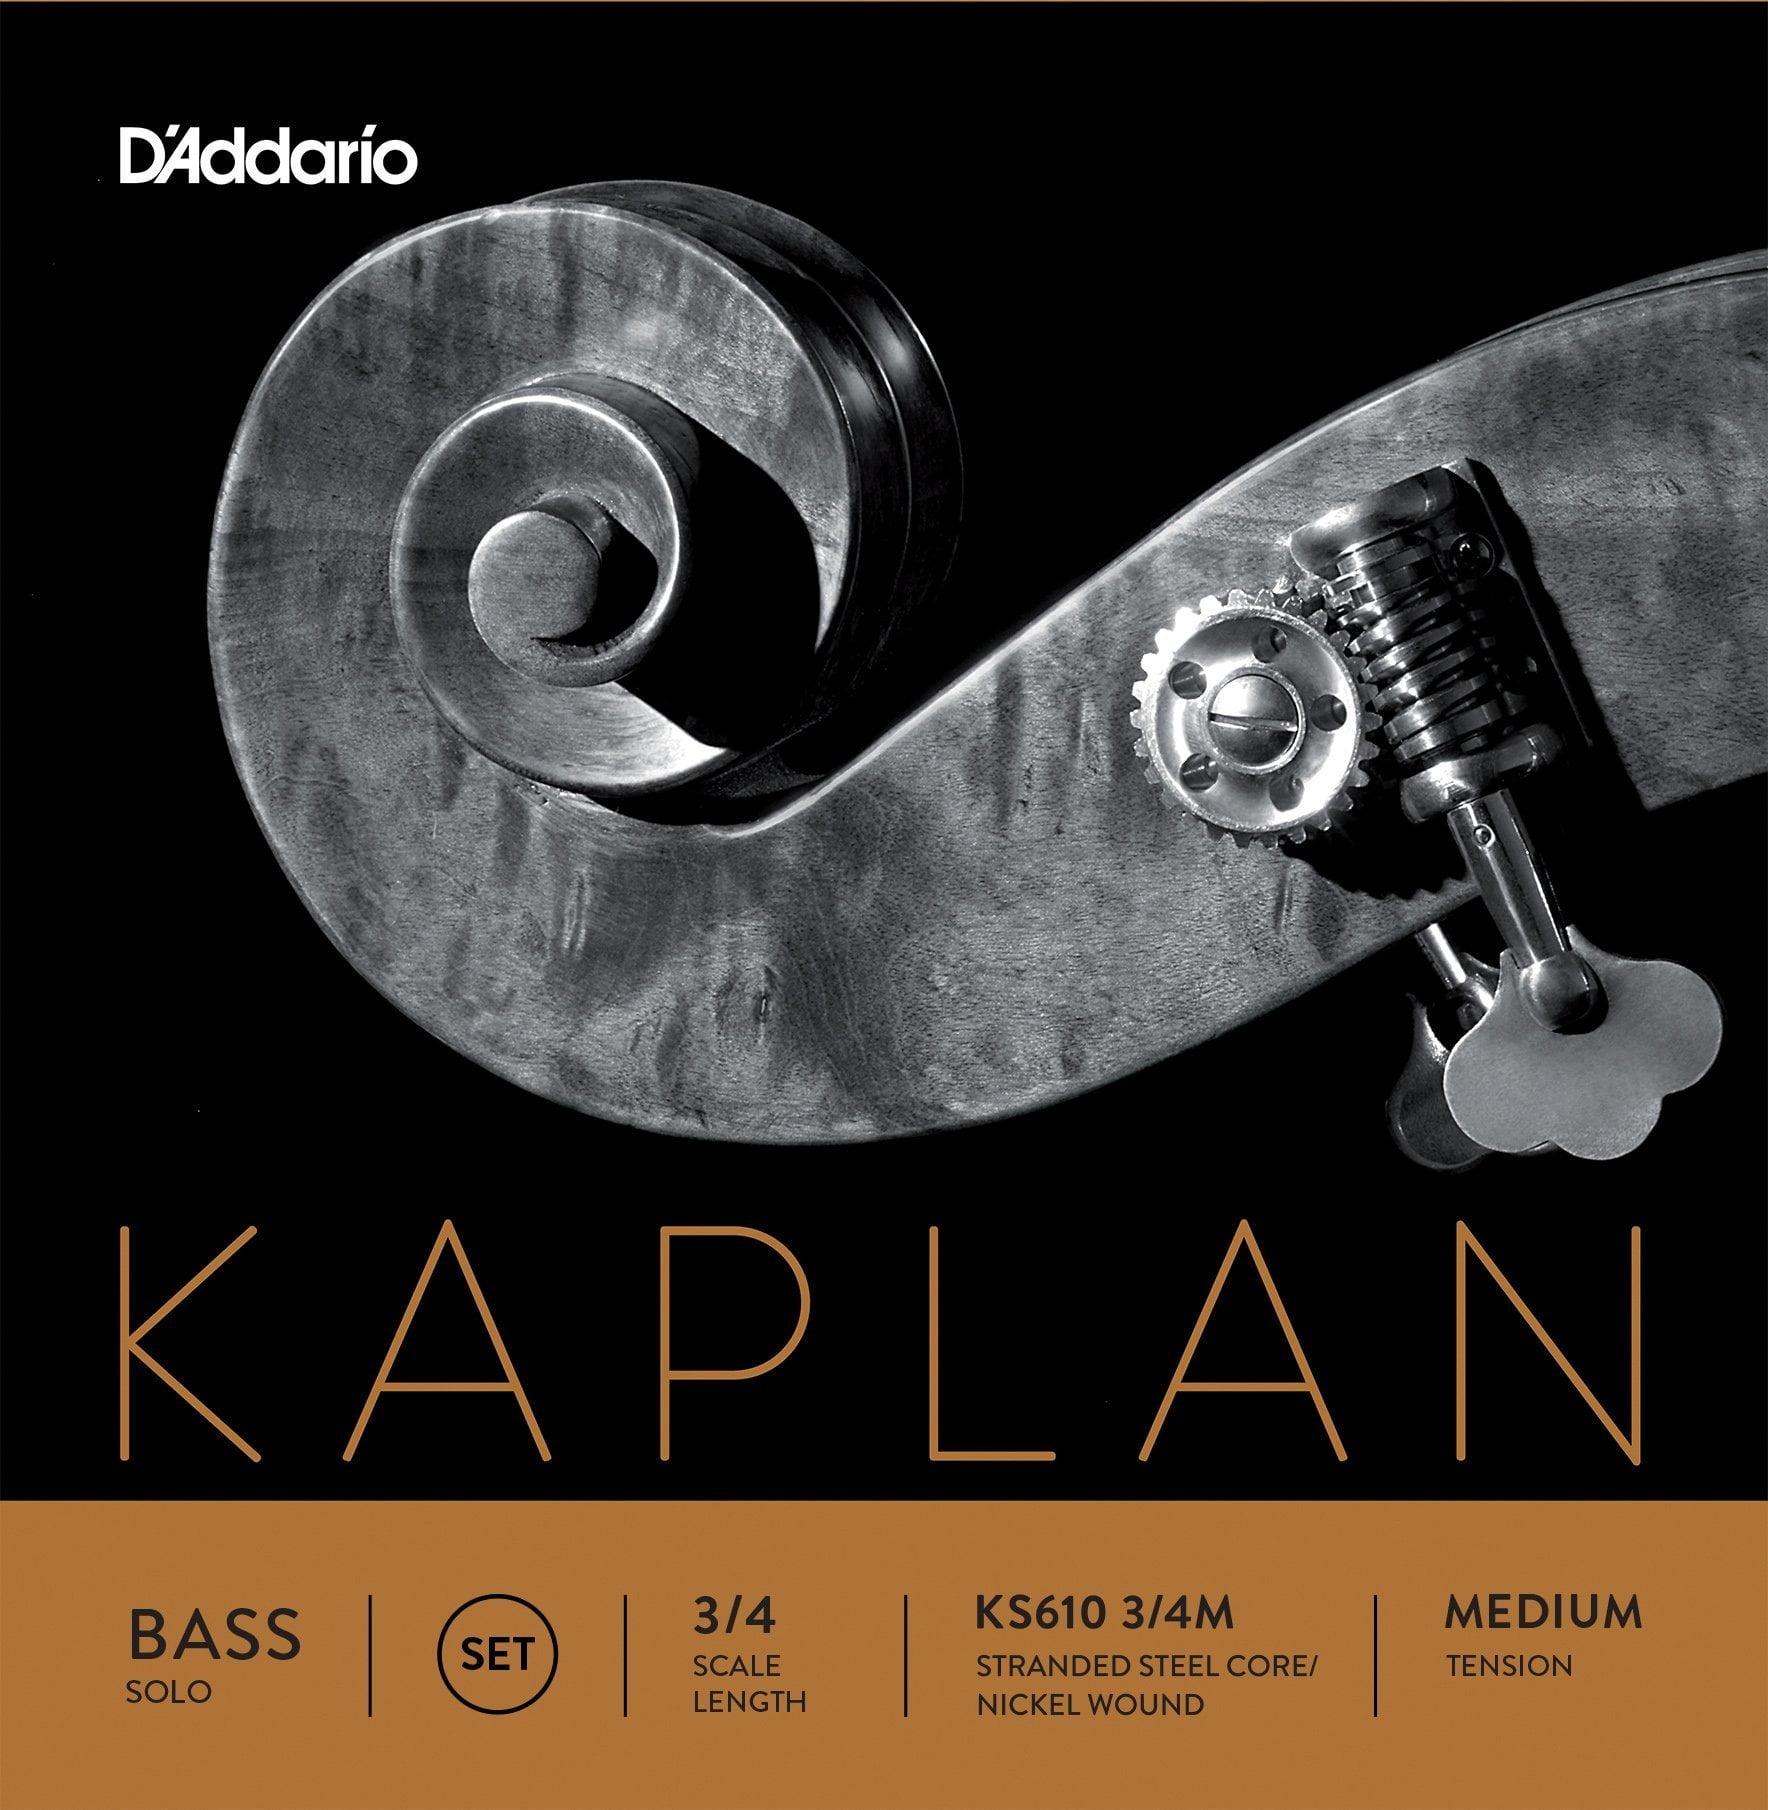 Kaplan Double Bass Solo Set of Strings 3/4 Medium